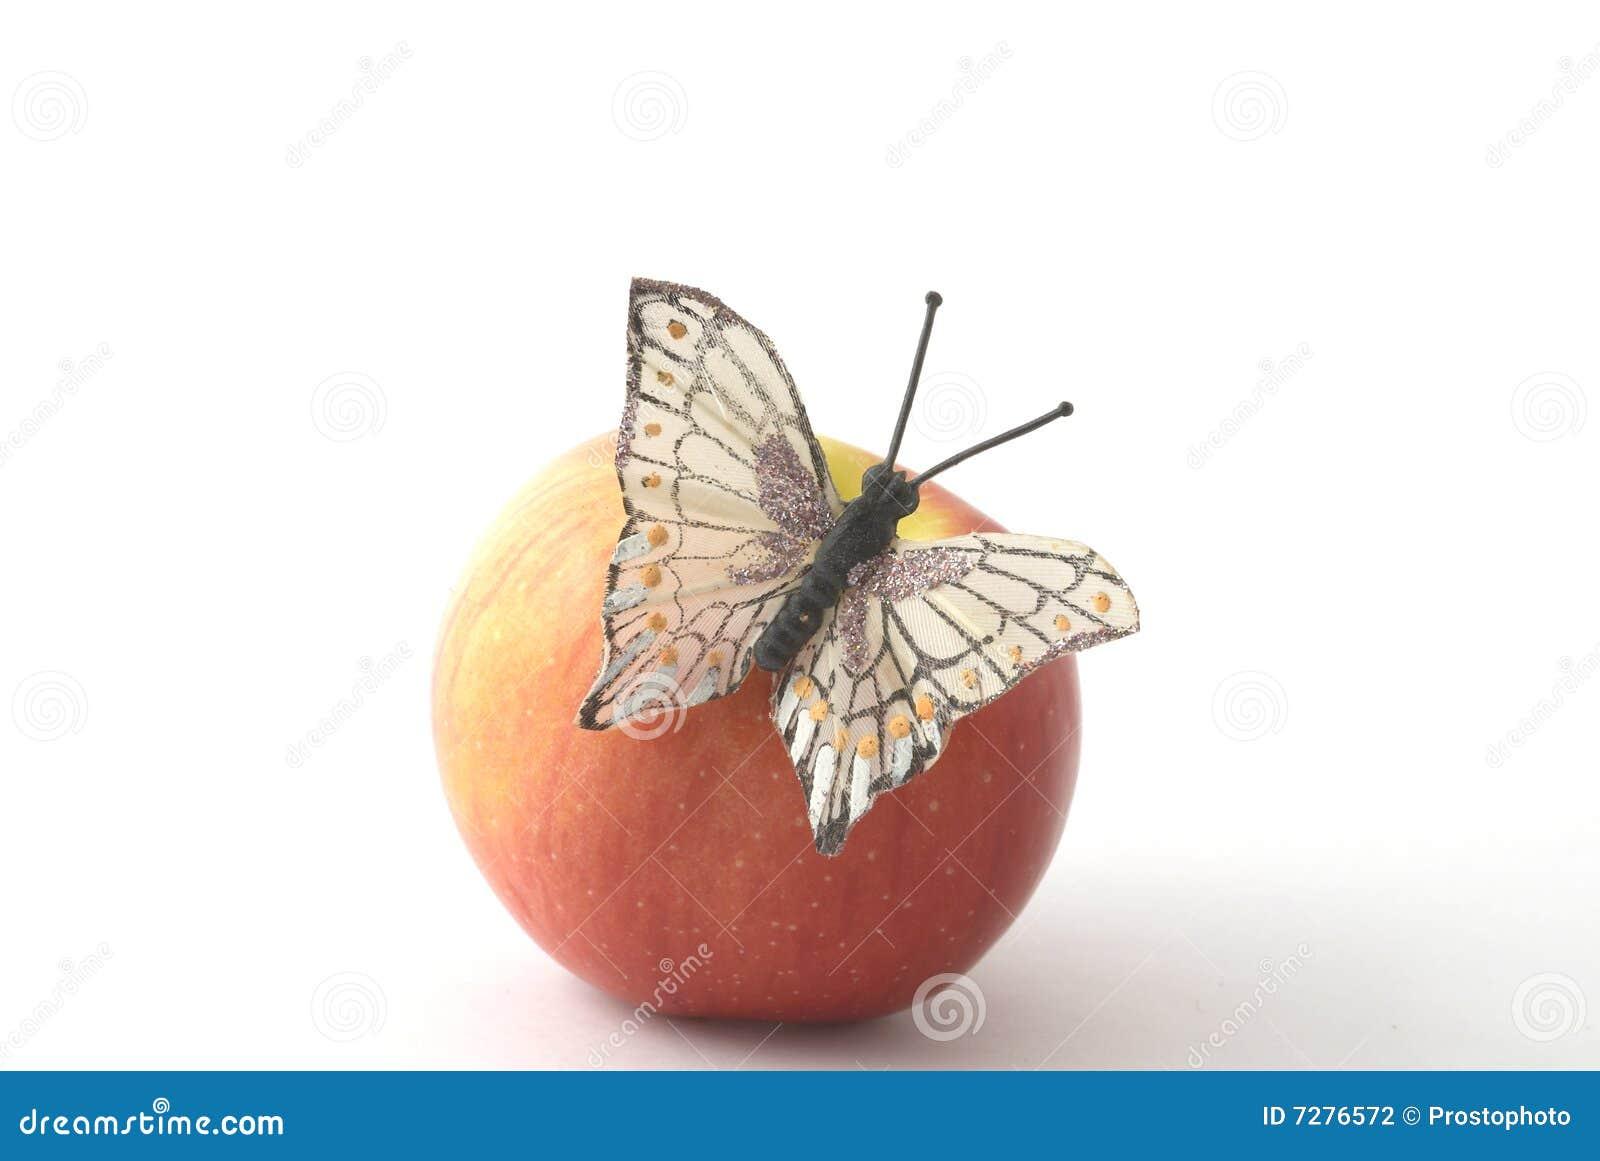 Mariposa en la manzana